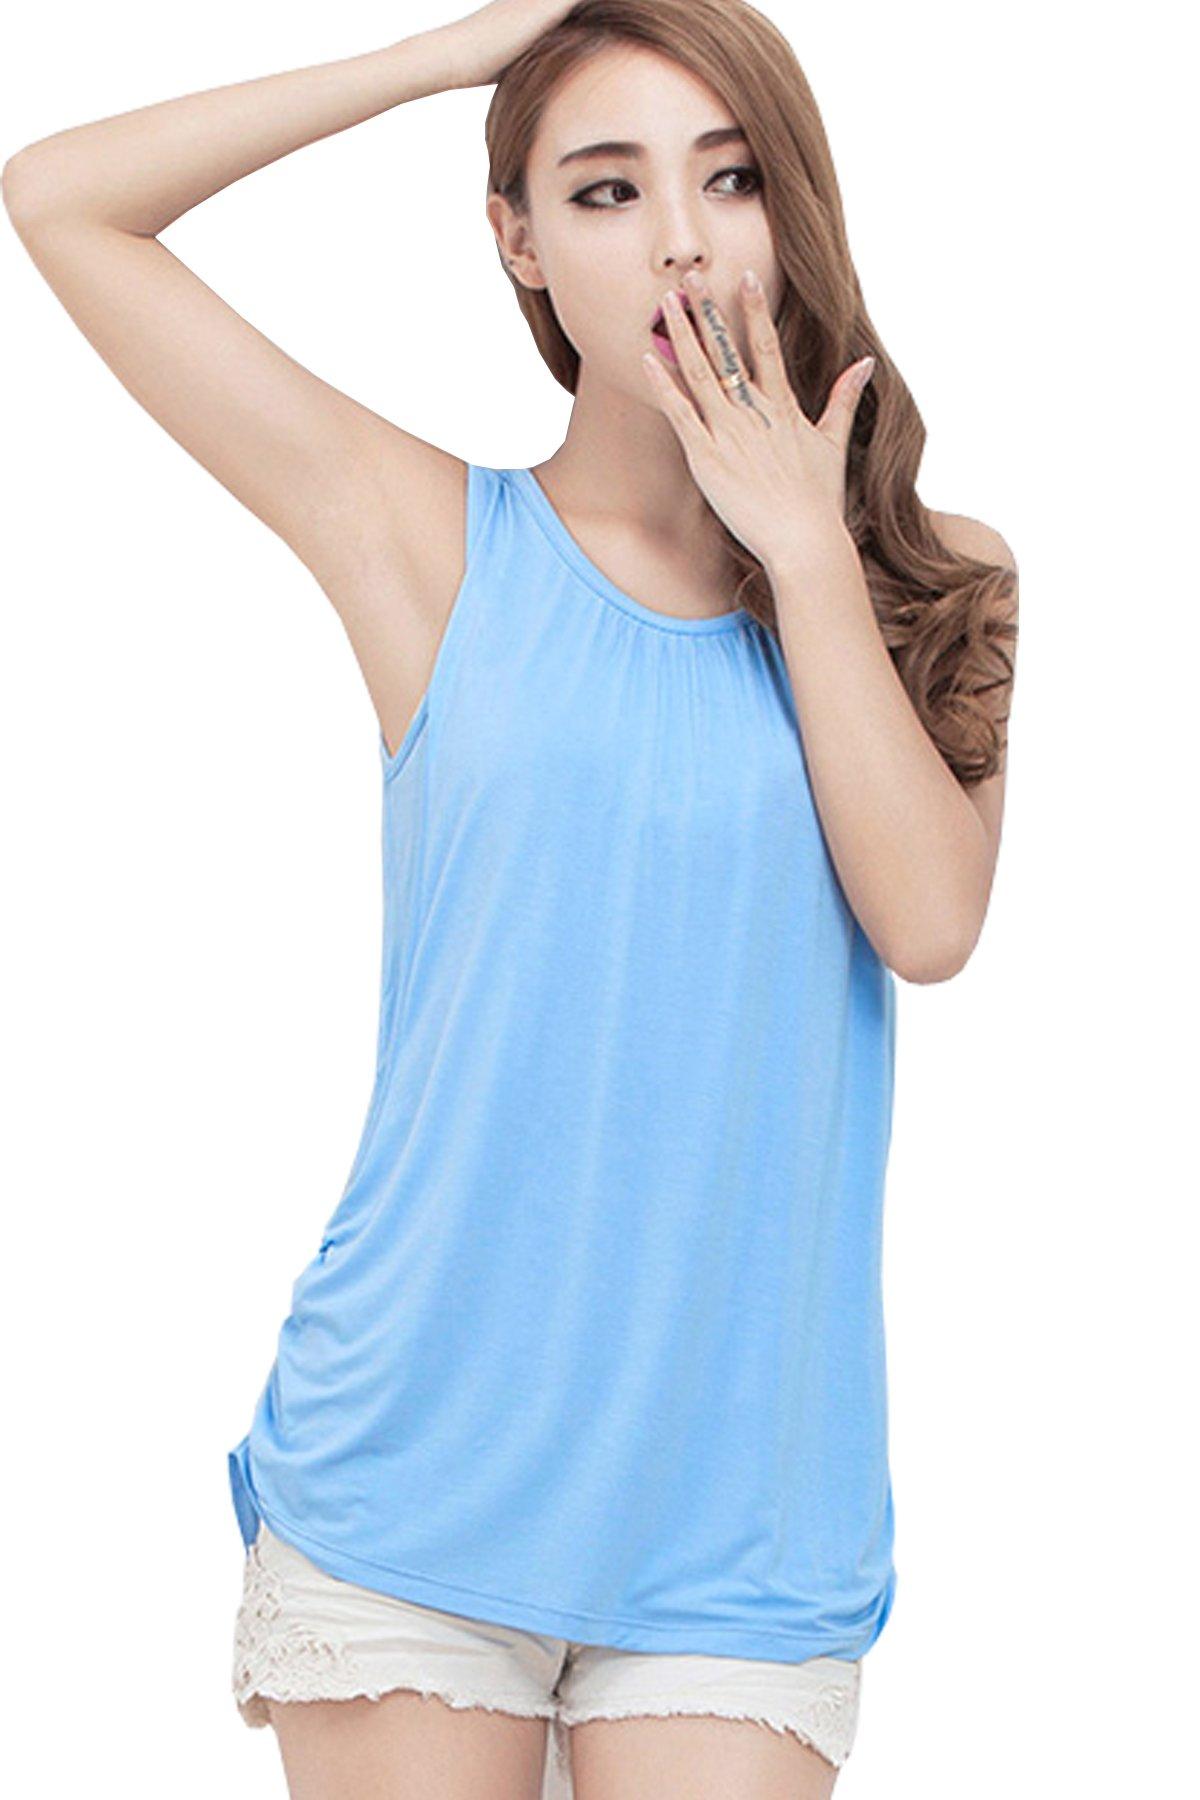 Smallshow Womens Sleeveless Maternity Nursing Tank Tops Breastfeeding Clothes